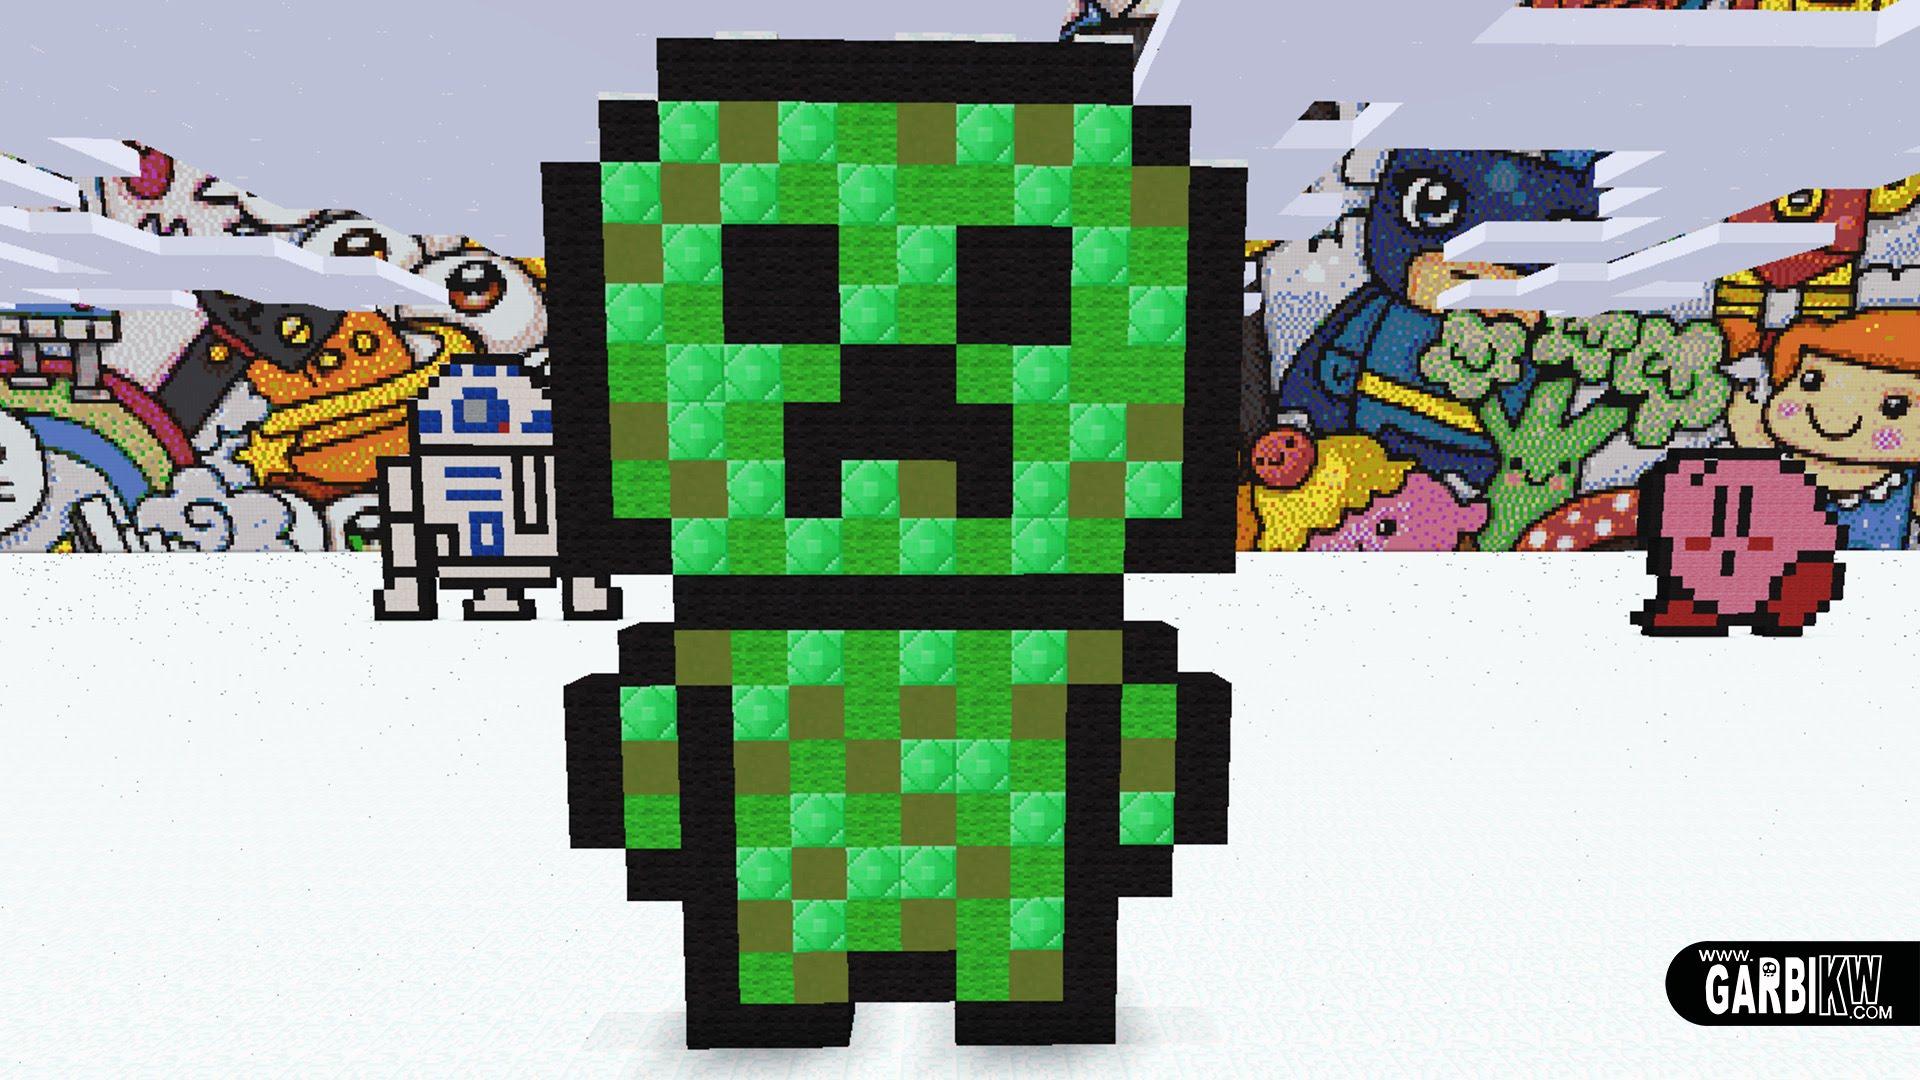 Drawn pug pixel art To KW Minecraft by YouTube